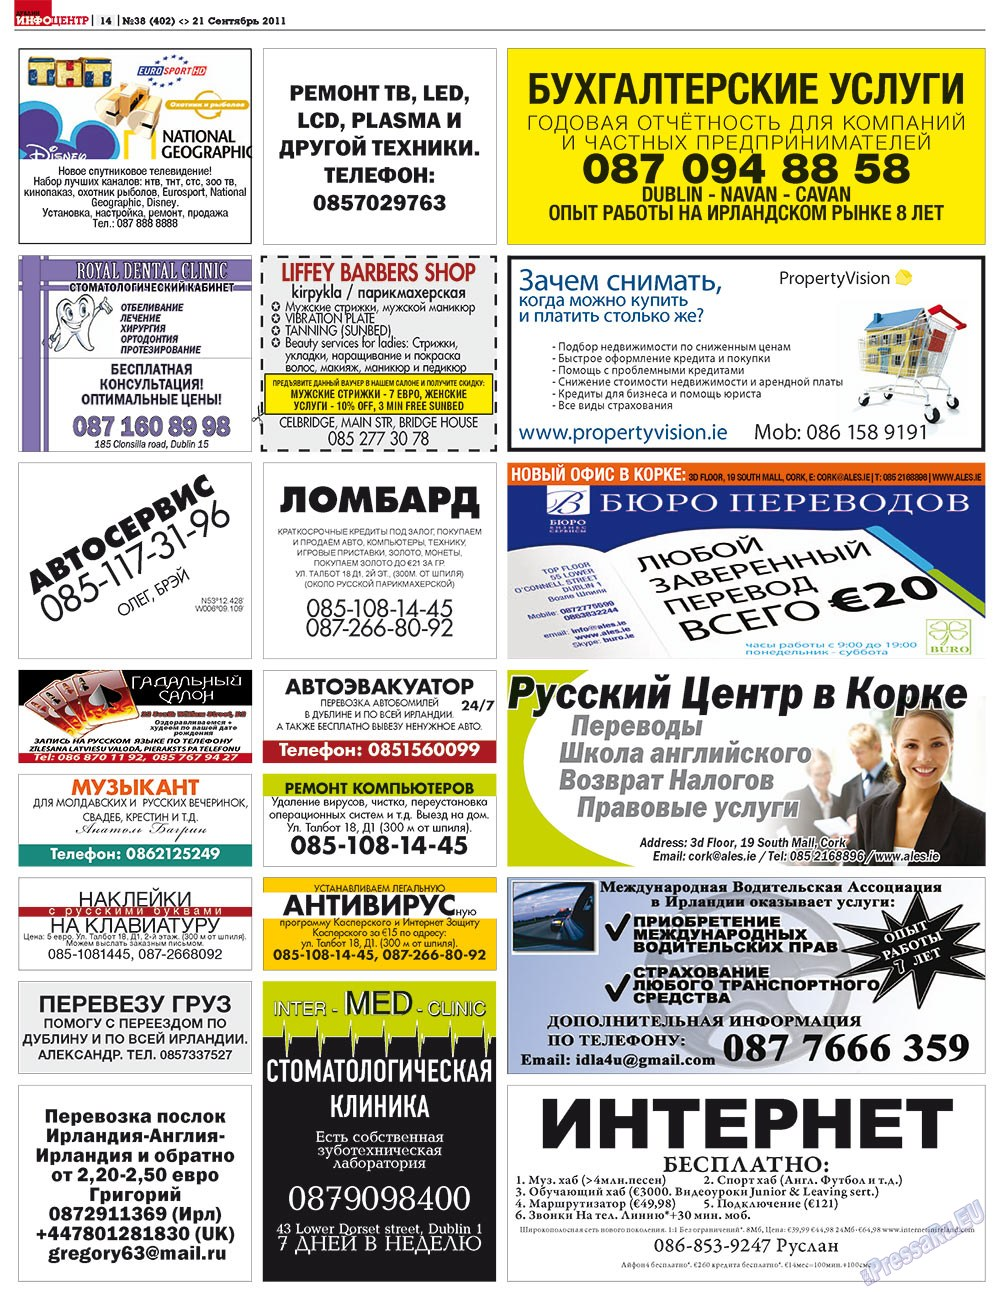 Дублин инфоцентр (газета). 2011 год, номер 38, стр. 14